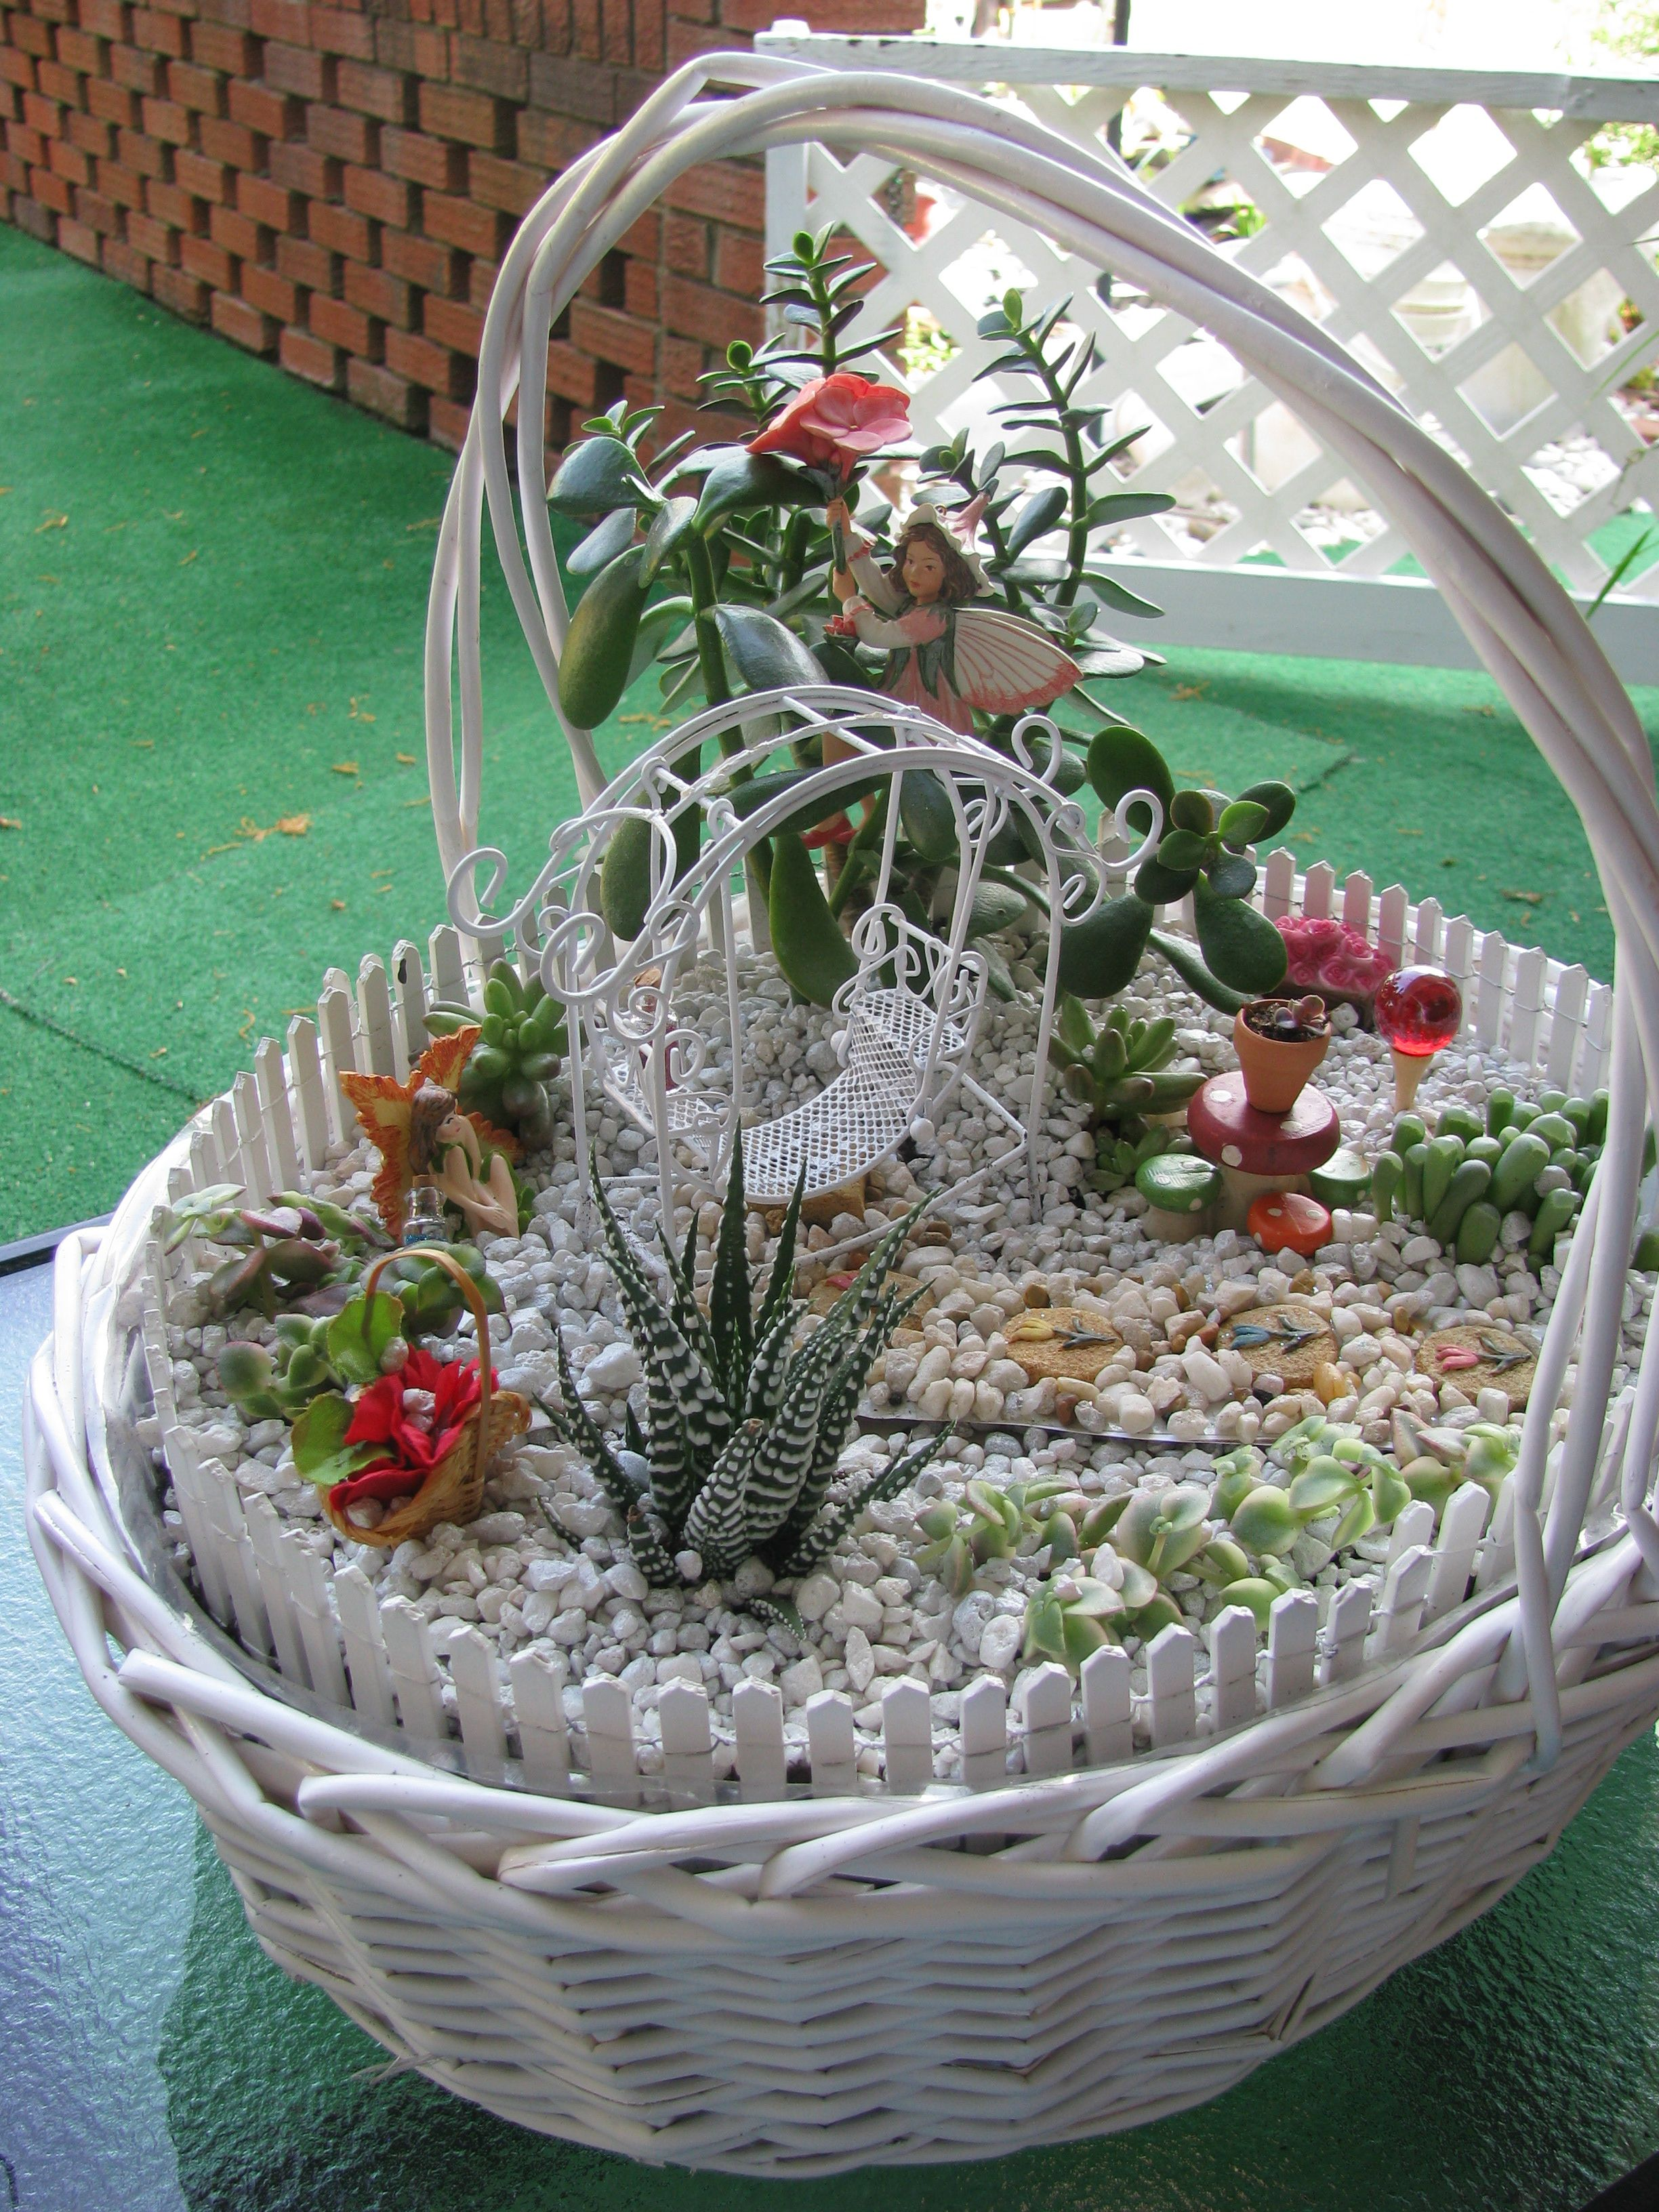 Gnome In Garden: My MiNiaTuRe SuCCuLENT FAiRY GaRDeN